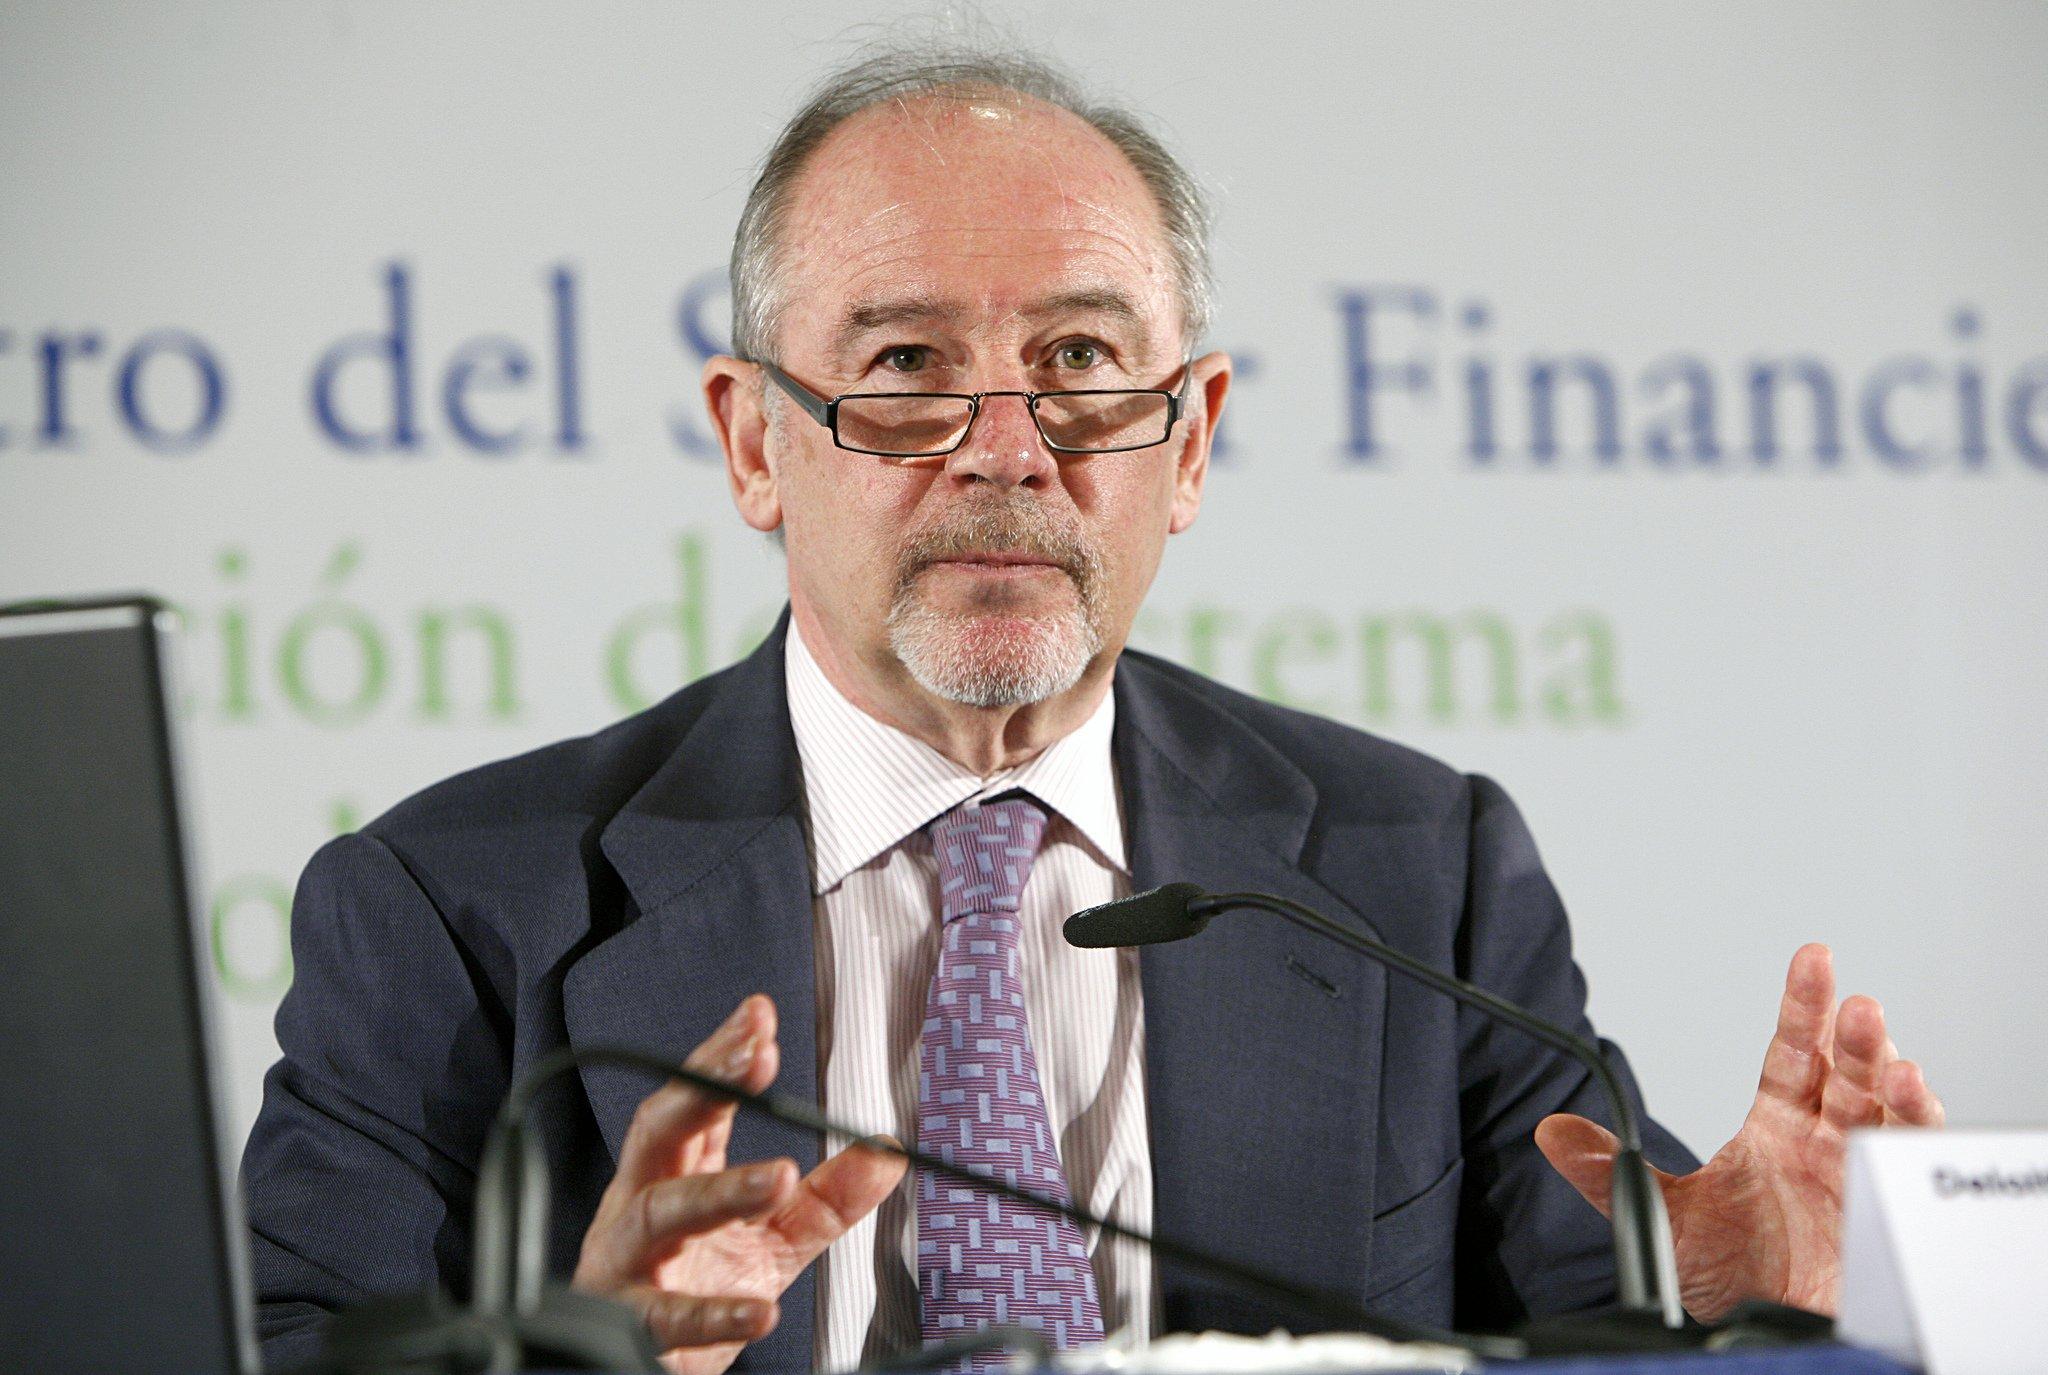 Caso OPV Bankia. Rodrigo Rato otra vez a juicio